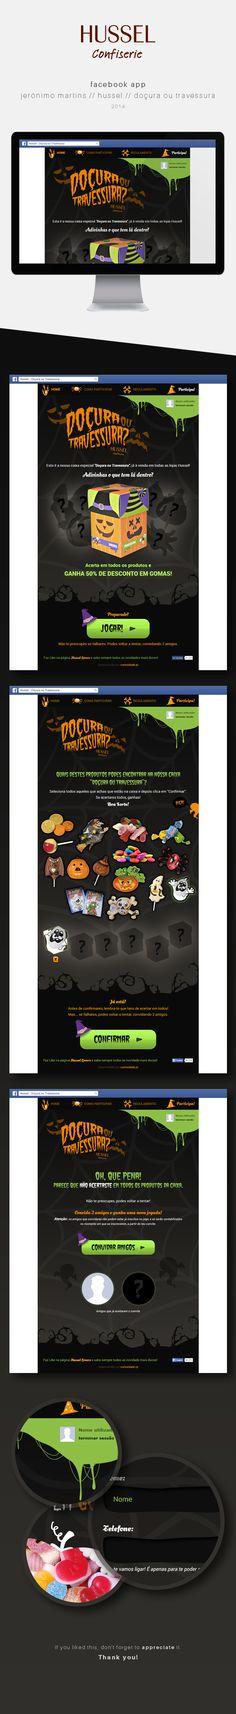 FacebookApp//Jerónimo Martins//Hussel//Halloween 2014 on Behance. Work from curiosidade.pt